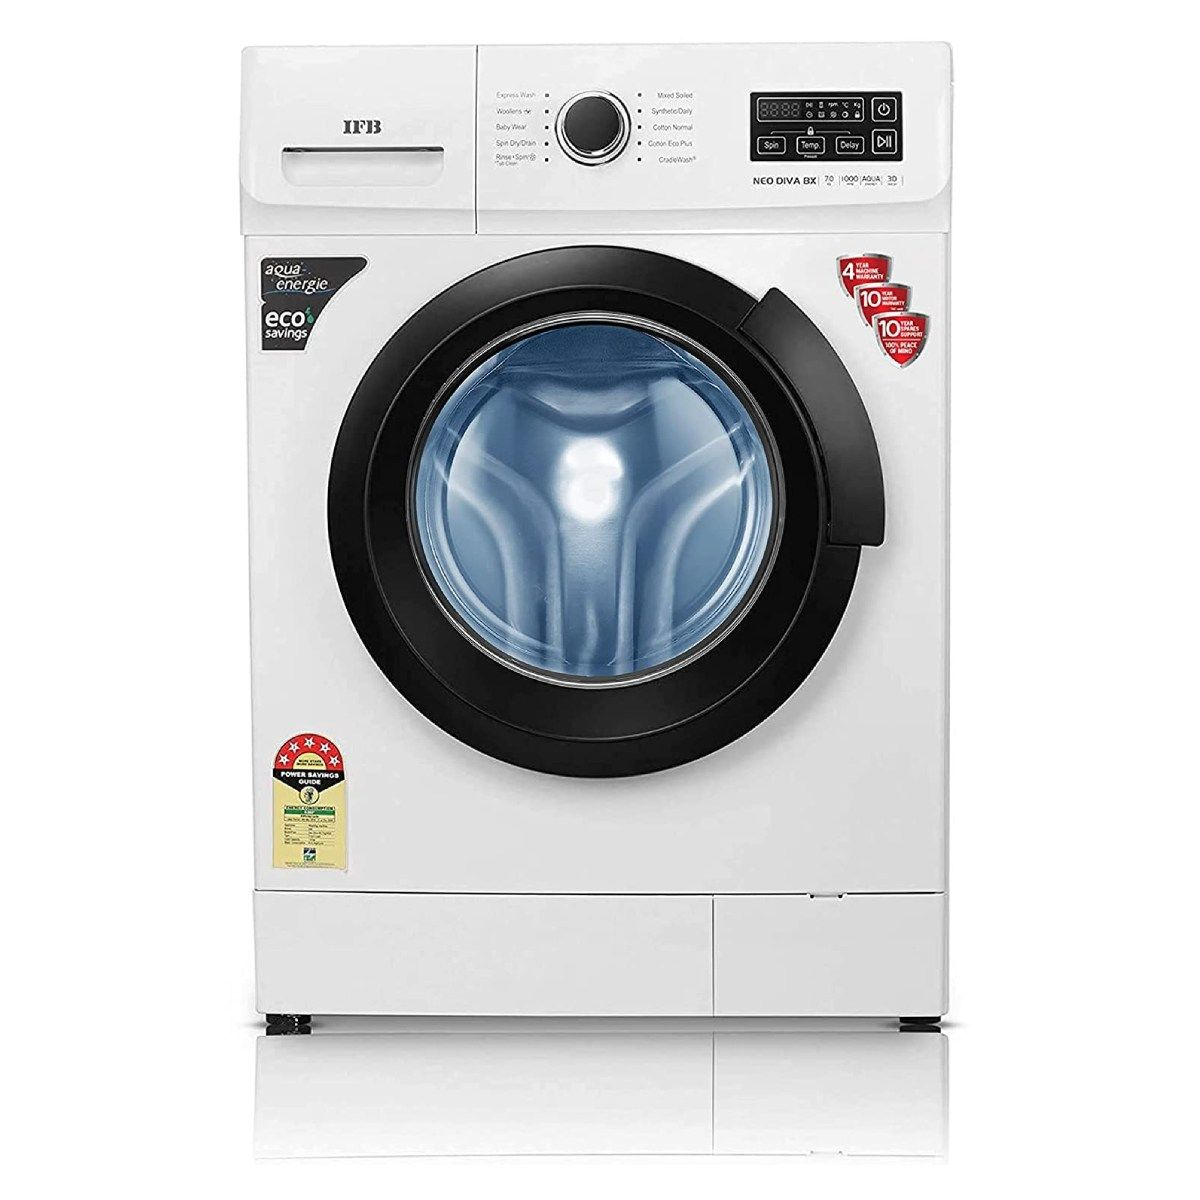 IFB 7 Kg Fully-Automatic Front Loading Washing Machine (Neo Diva BX)